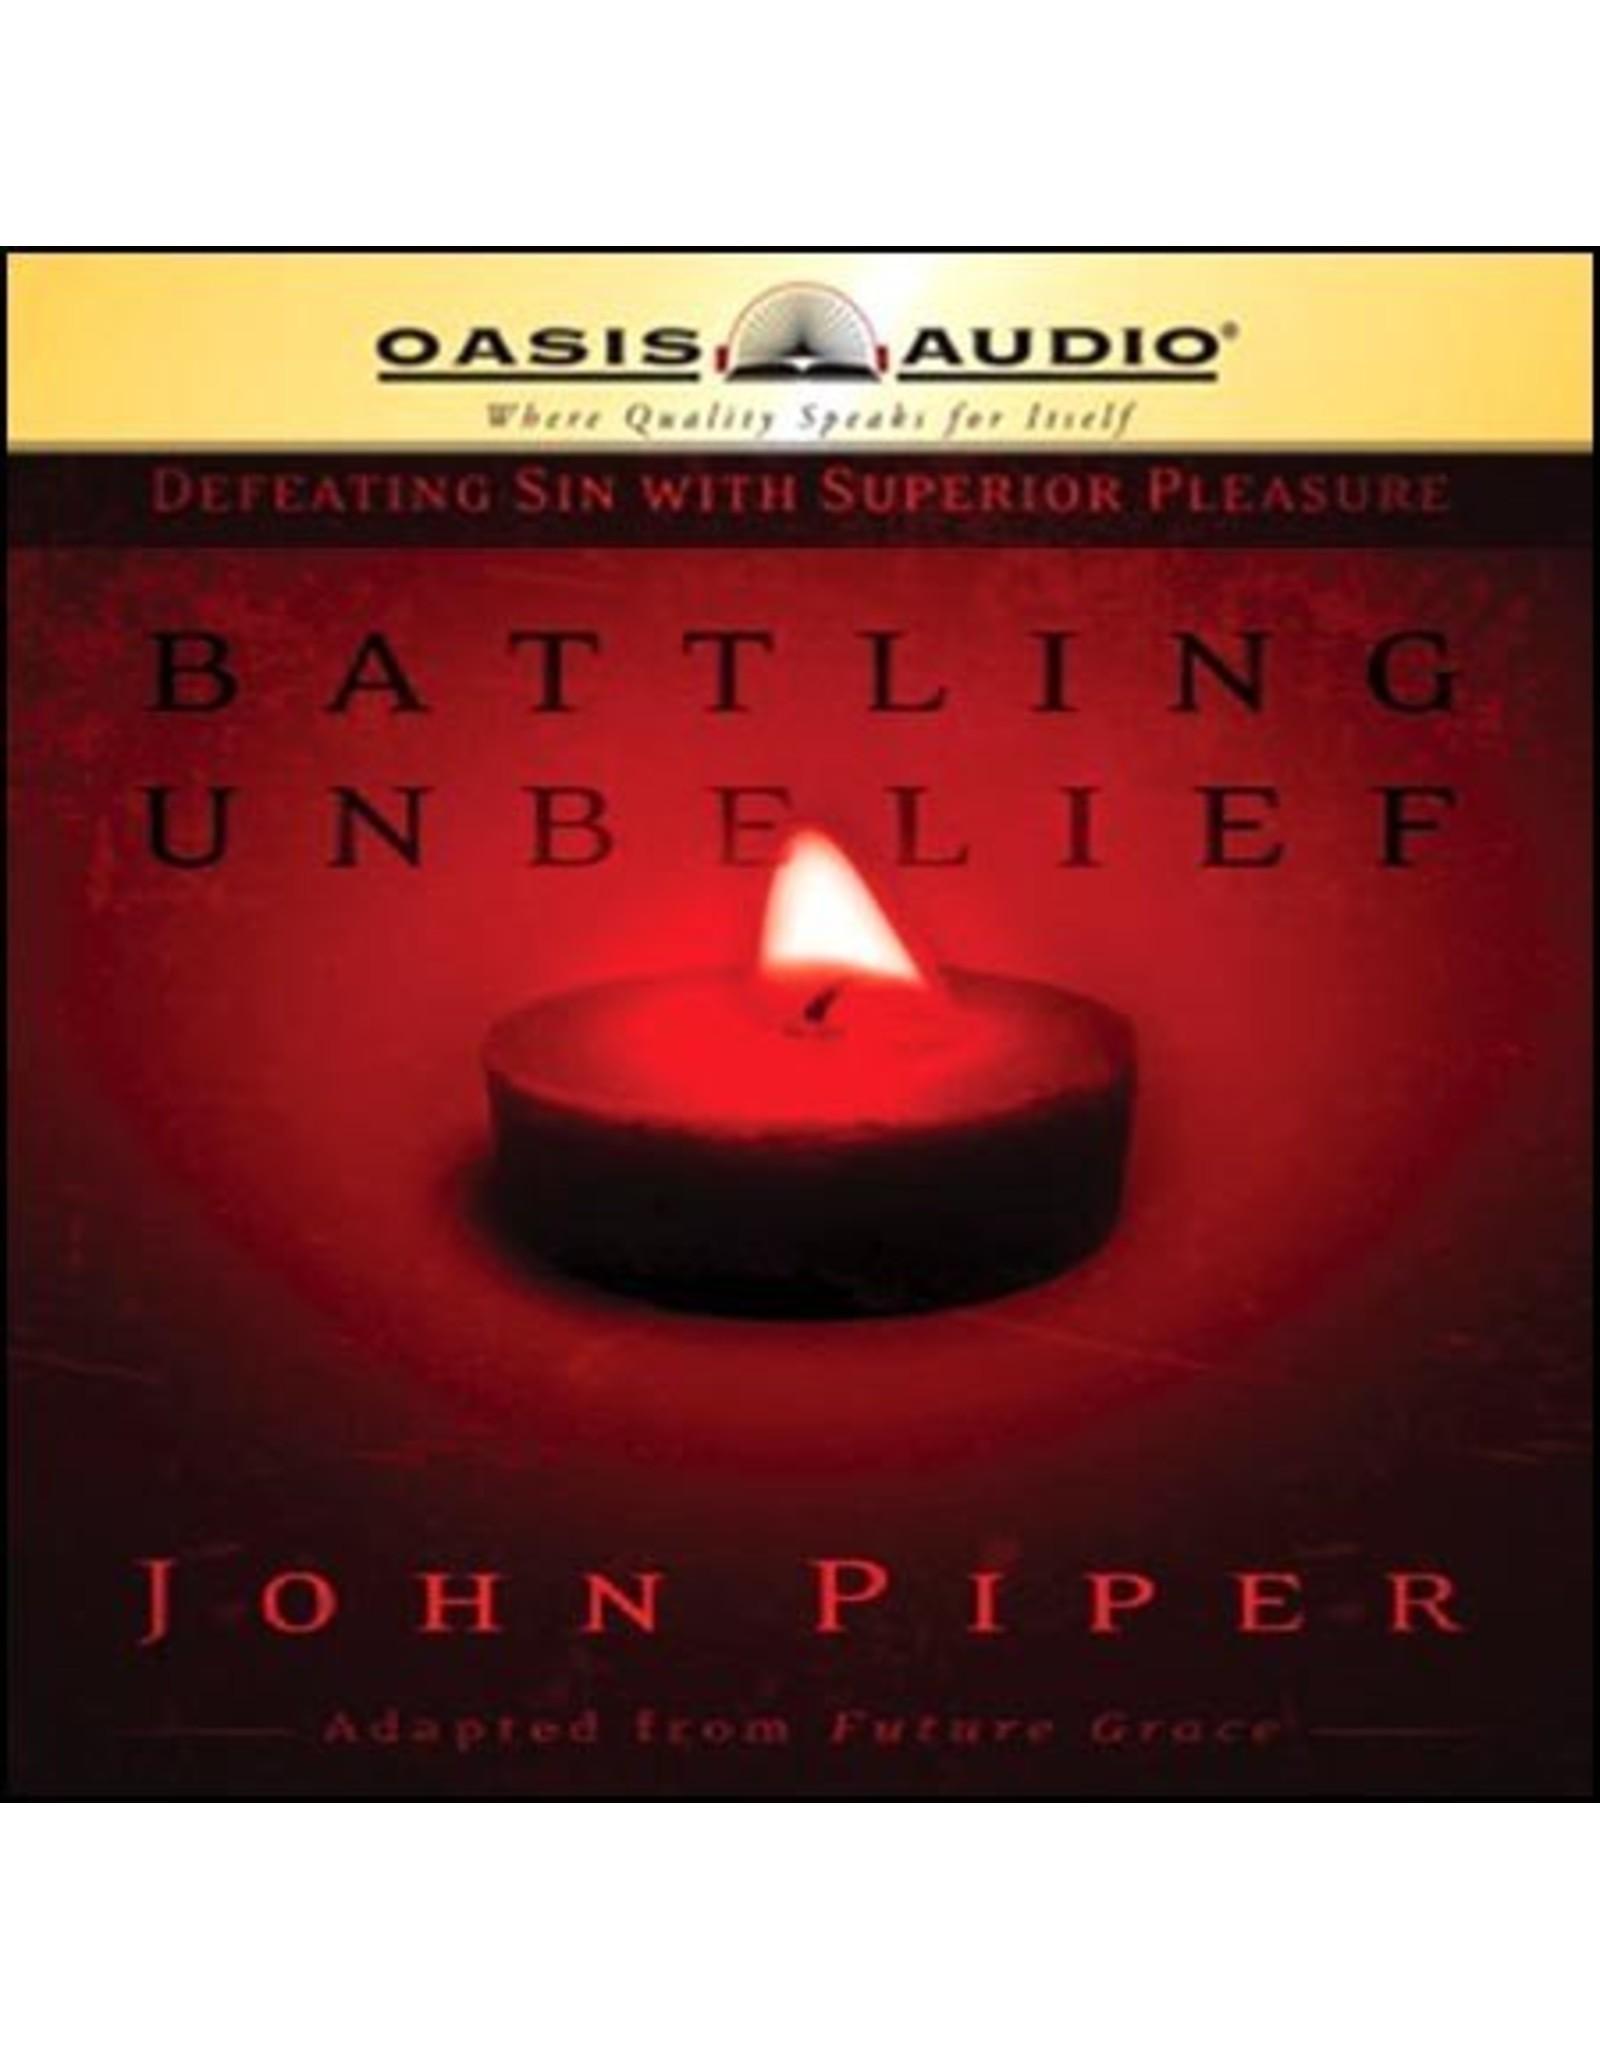 Oasis Battling Unbelief: Defeating Sin with Superior Pleasure (Audio CD)